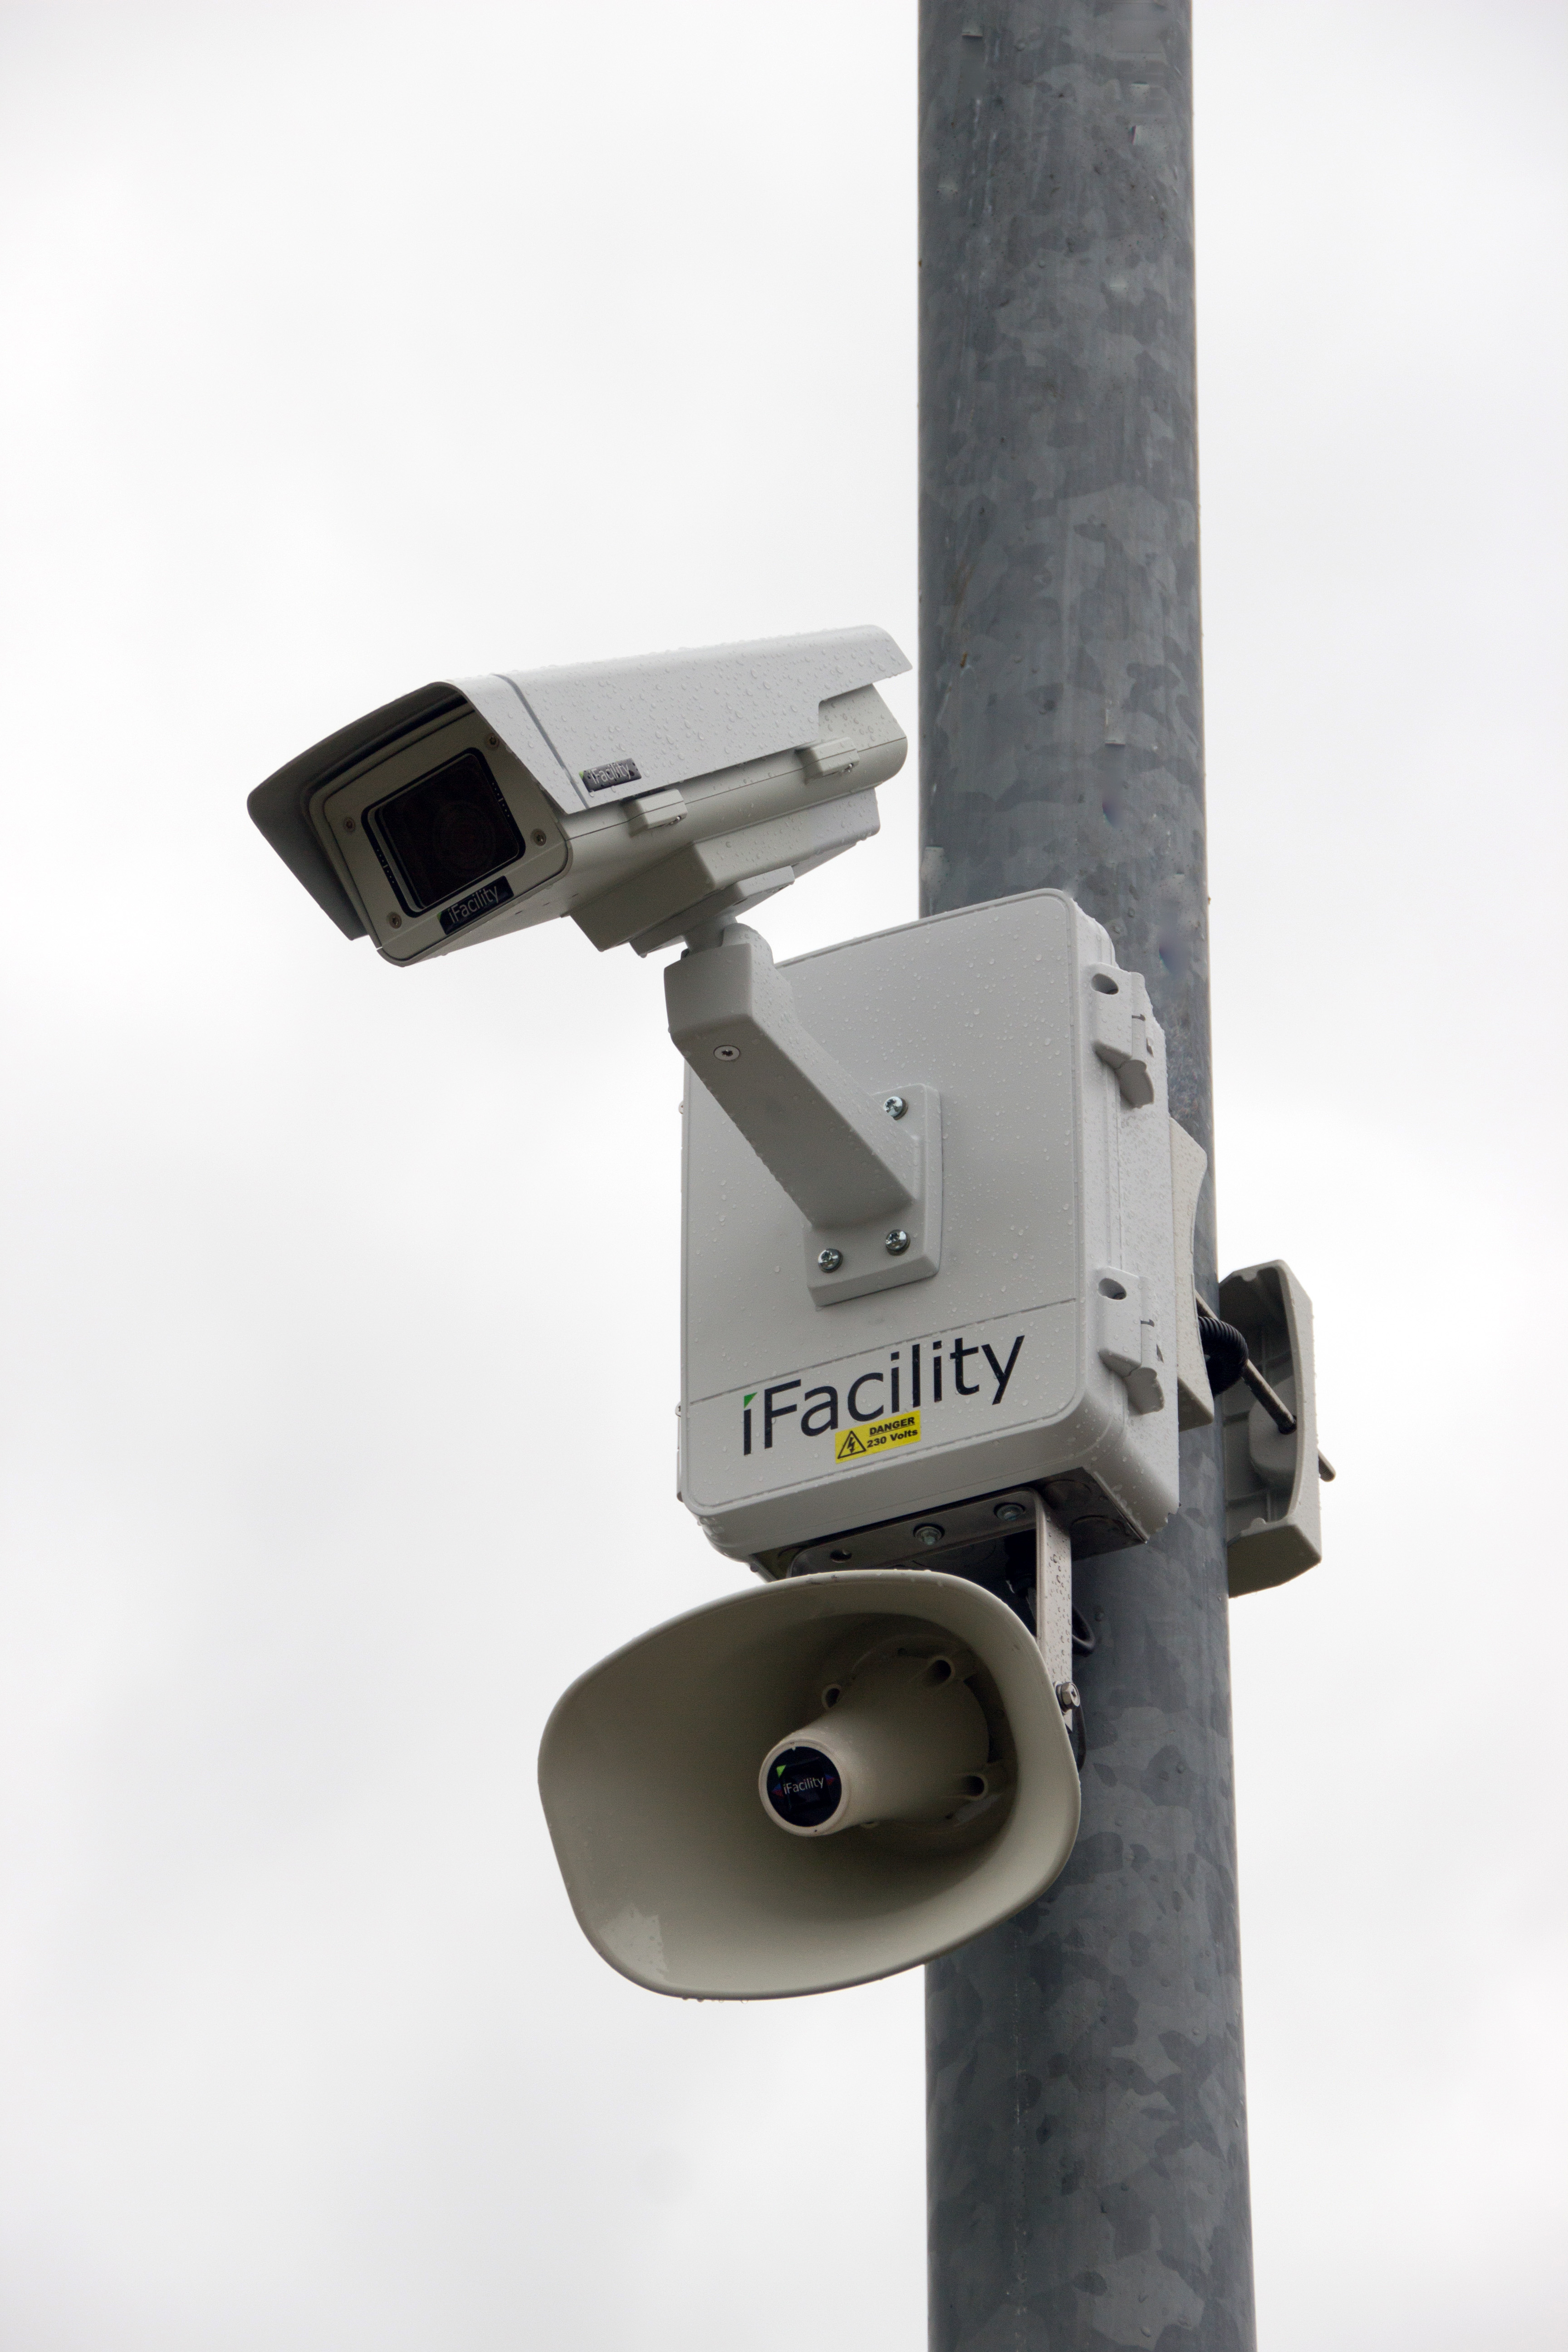 File:CCTV camera and iFacility IP Audio speaker on a pole ...